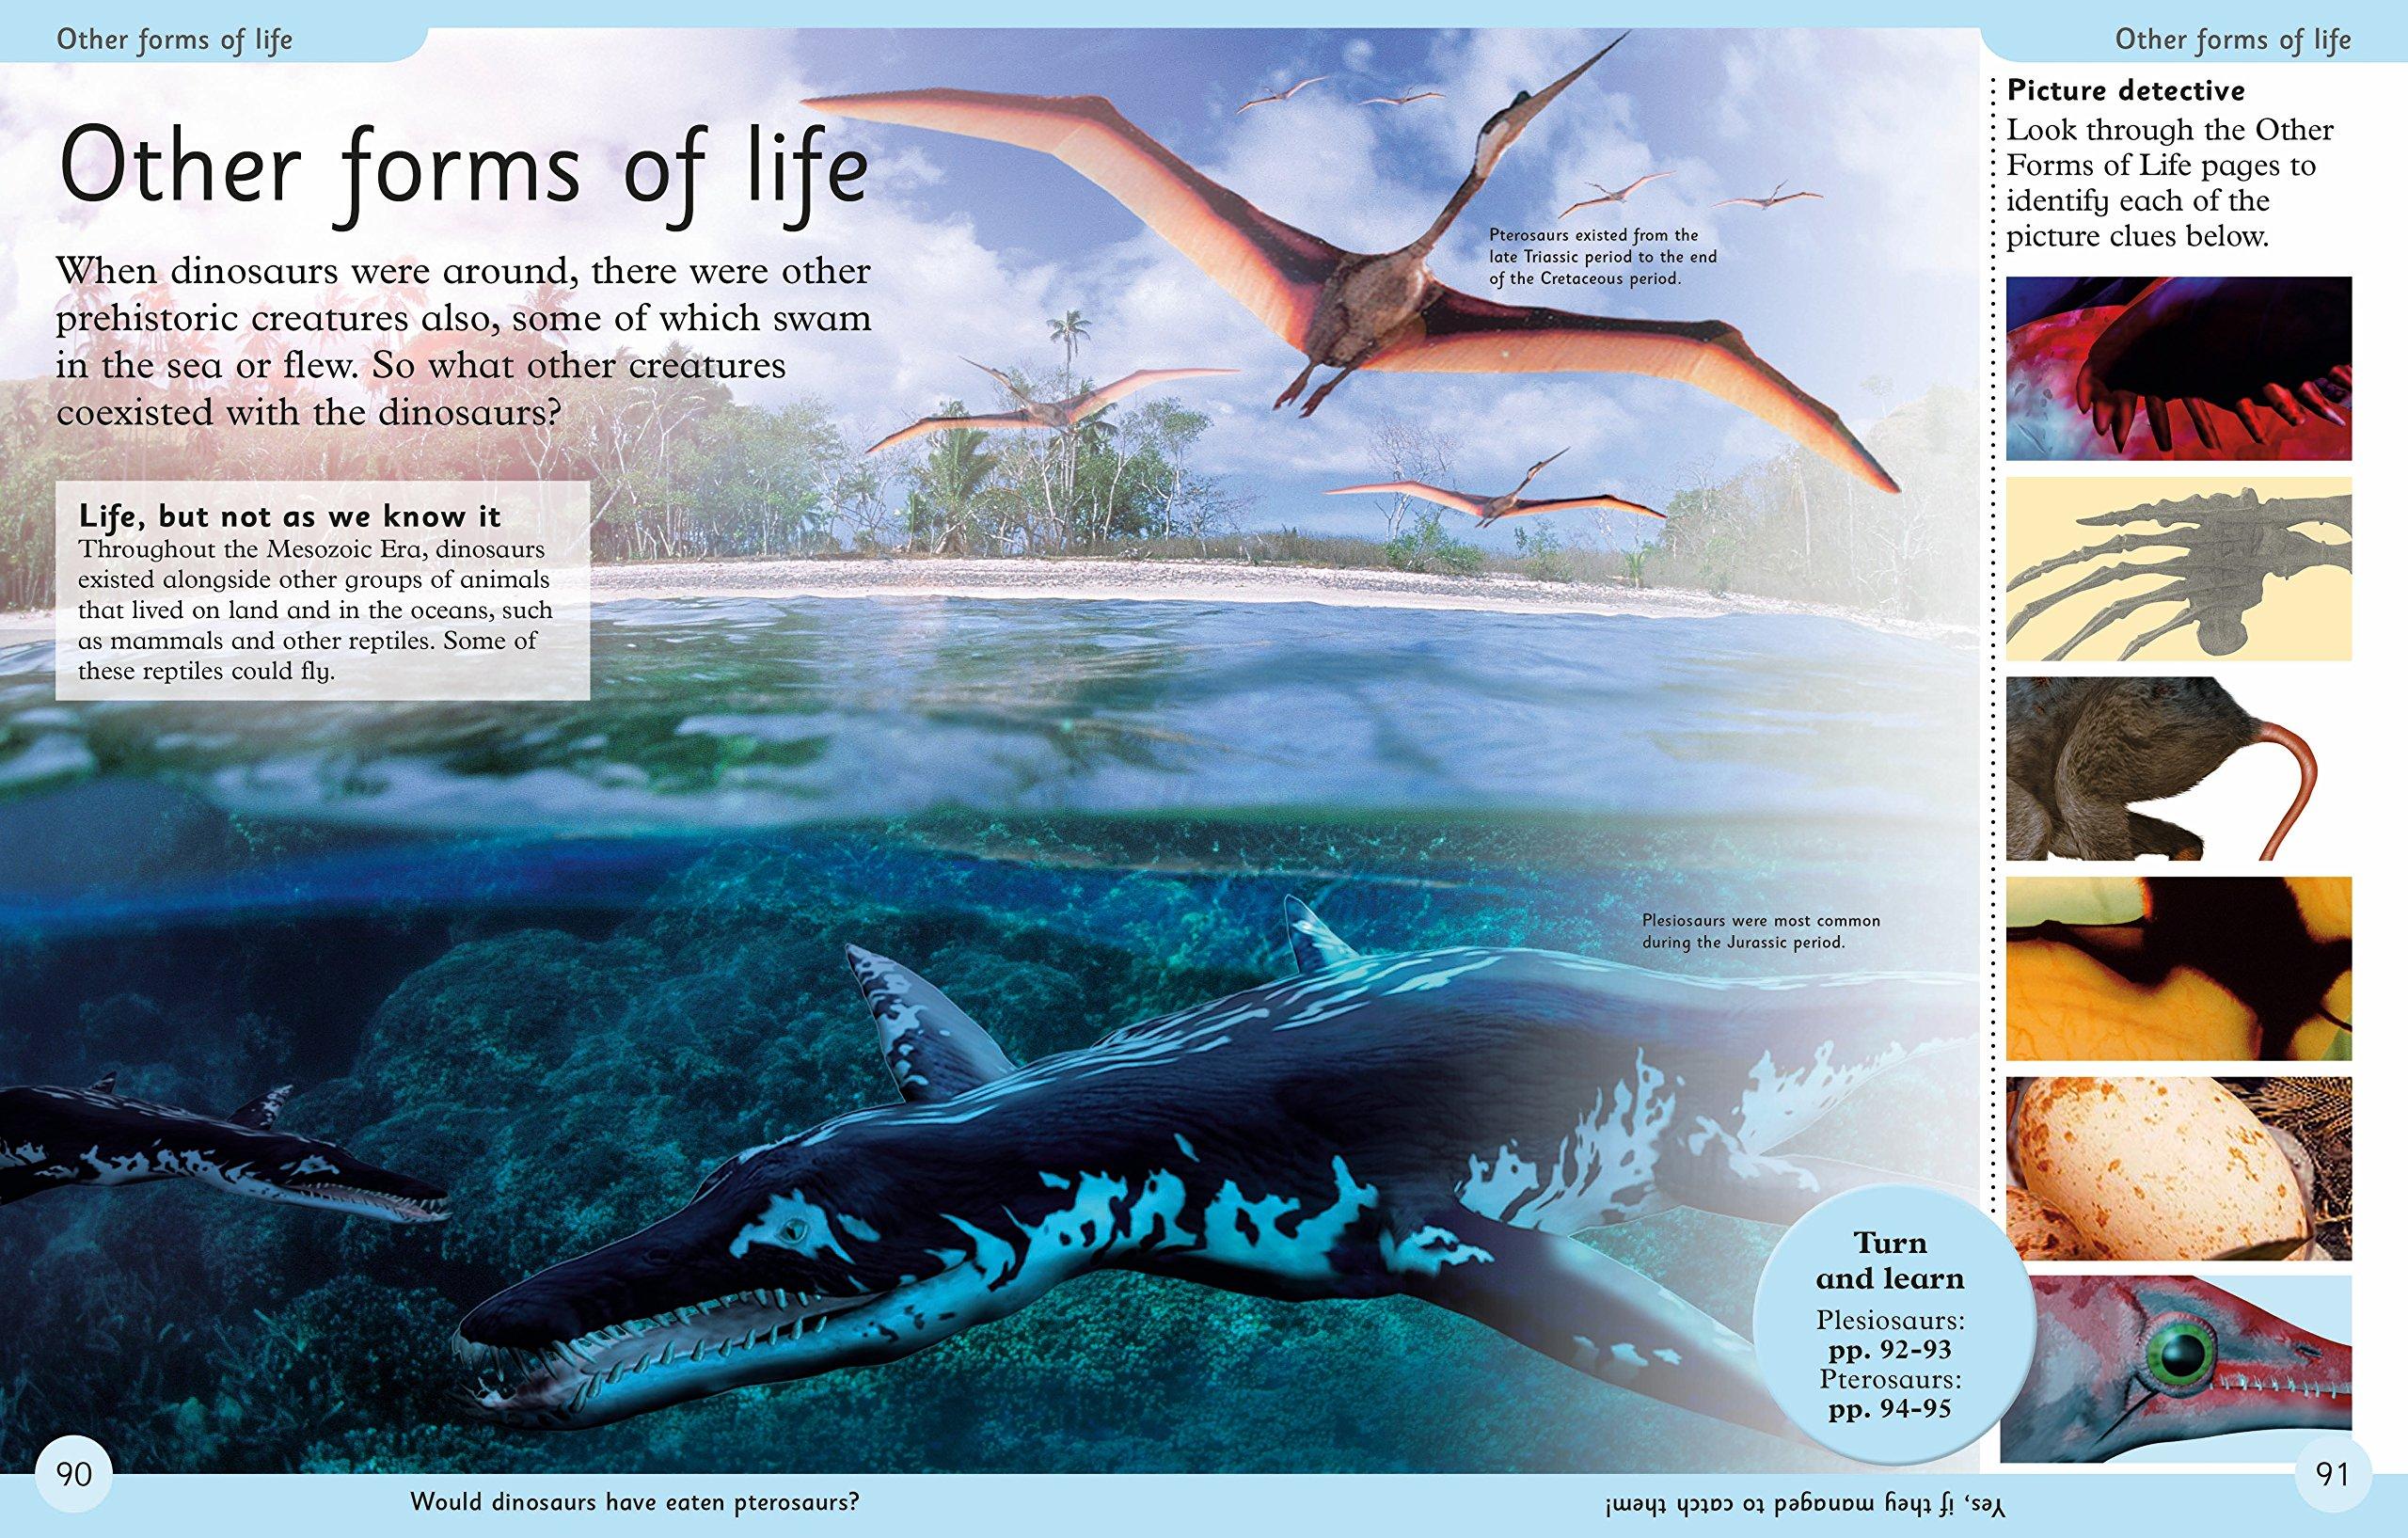 First Dinosaur Encyclopedia (DK First Reference) by DK Publishing Dorling Kindersley (Image #5)